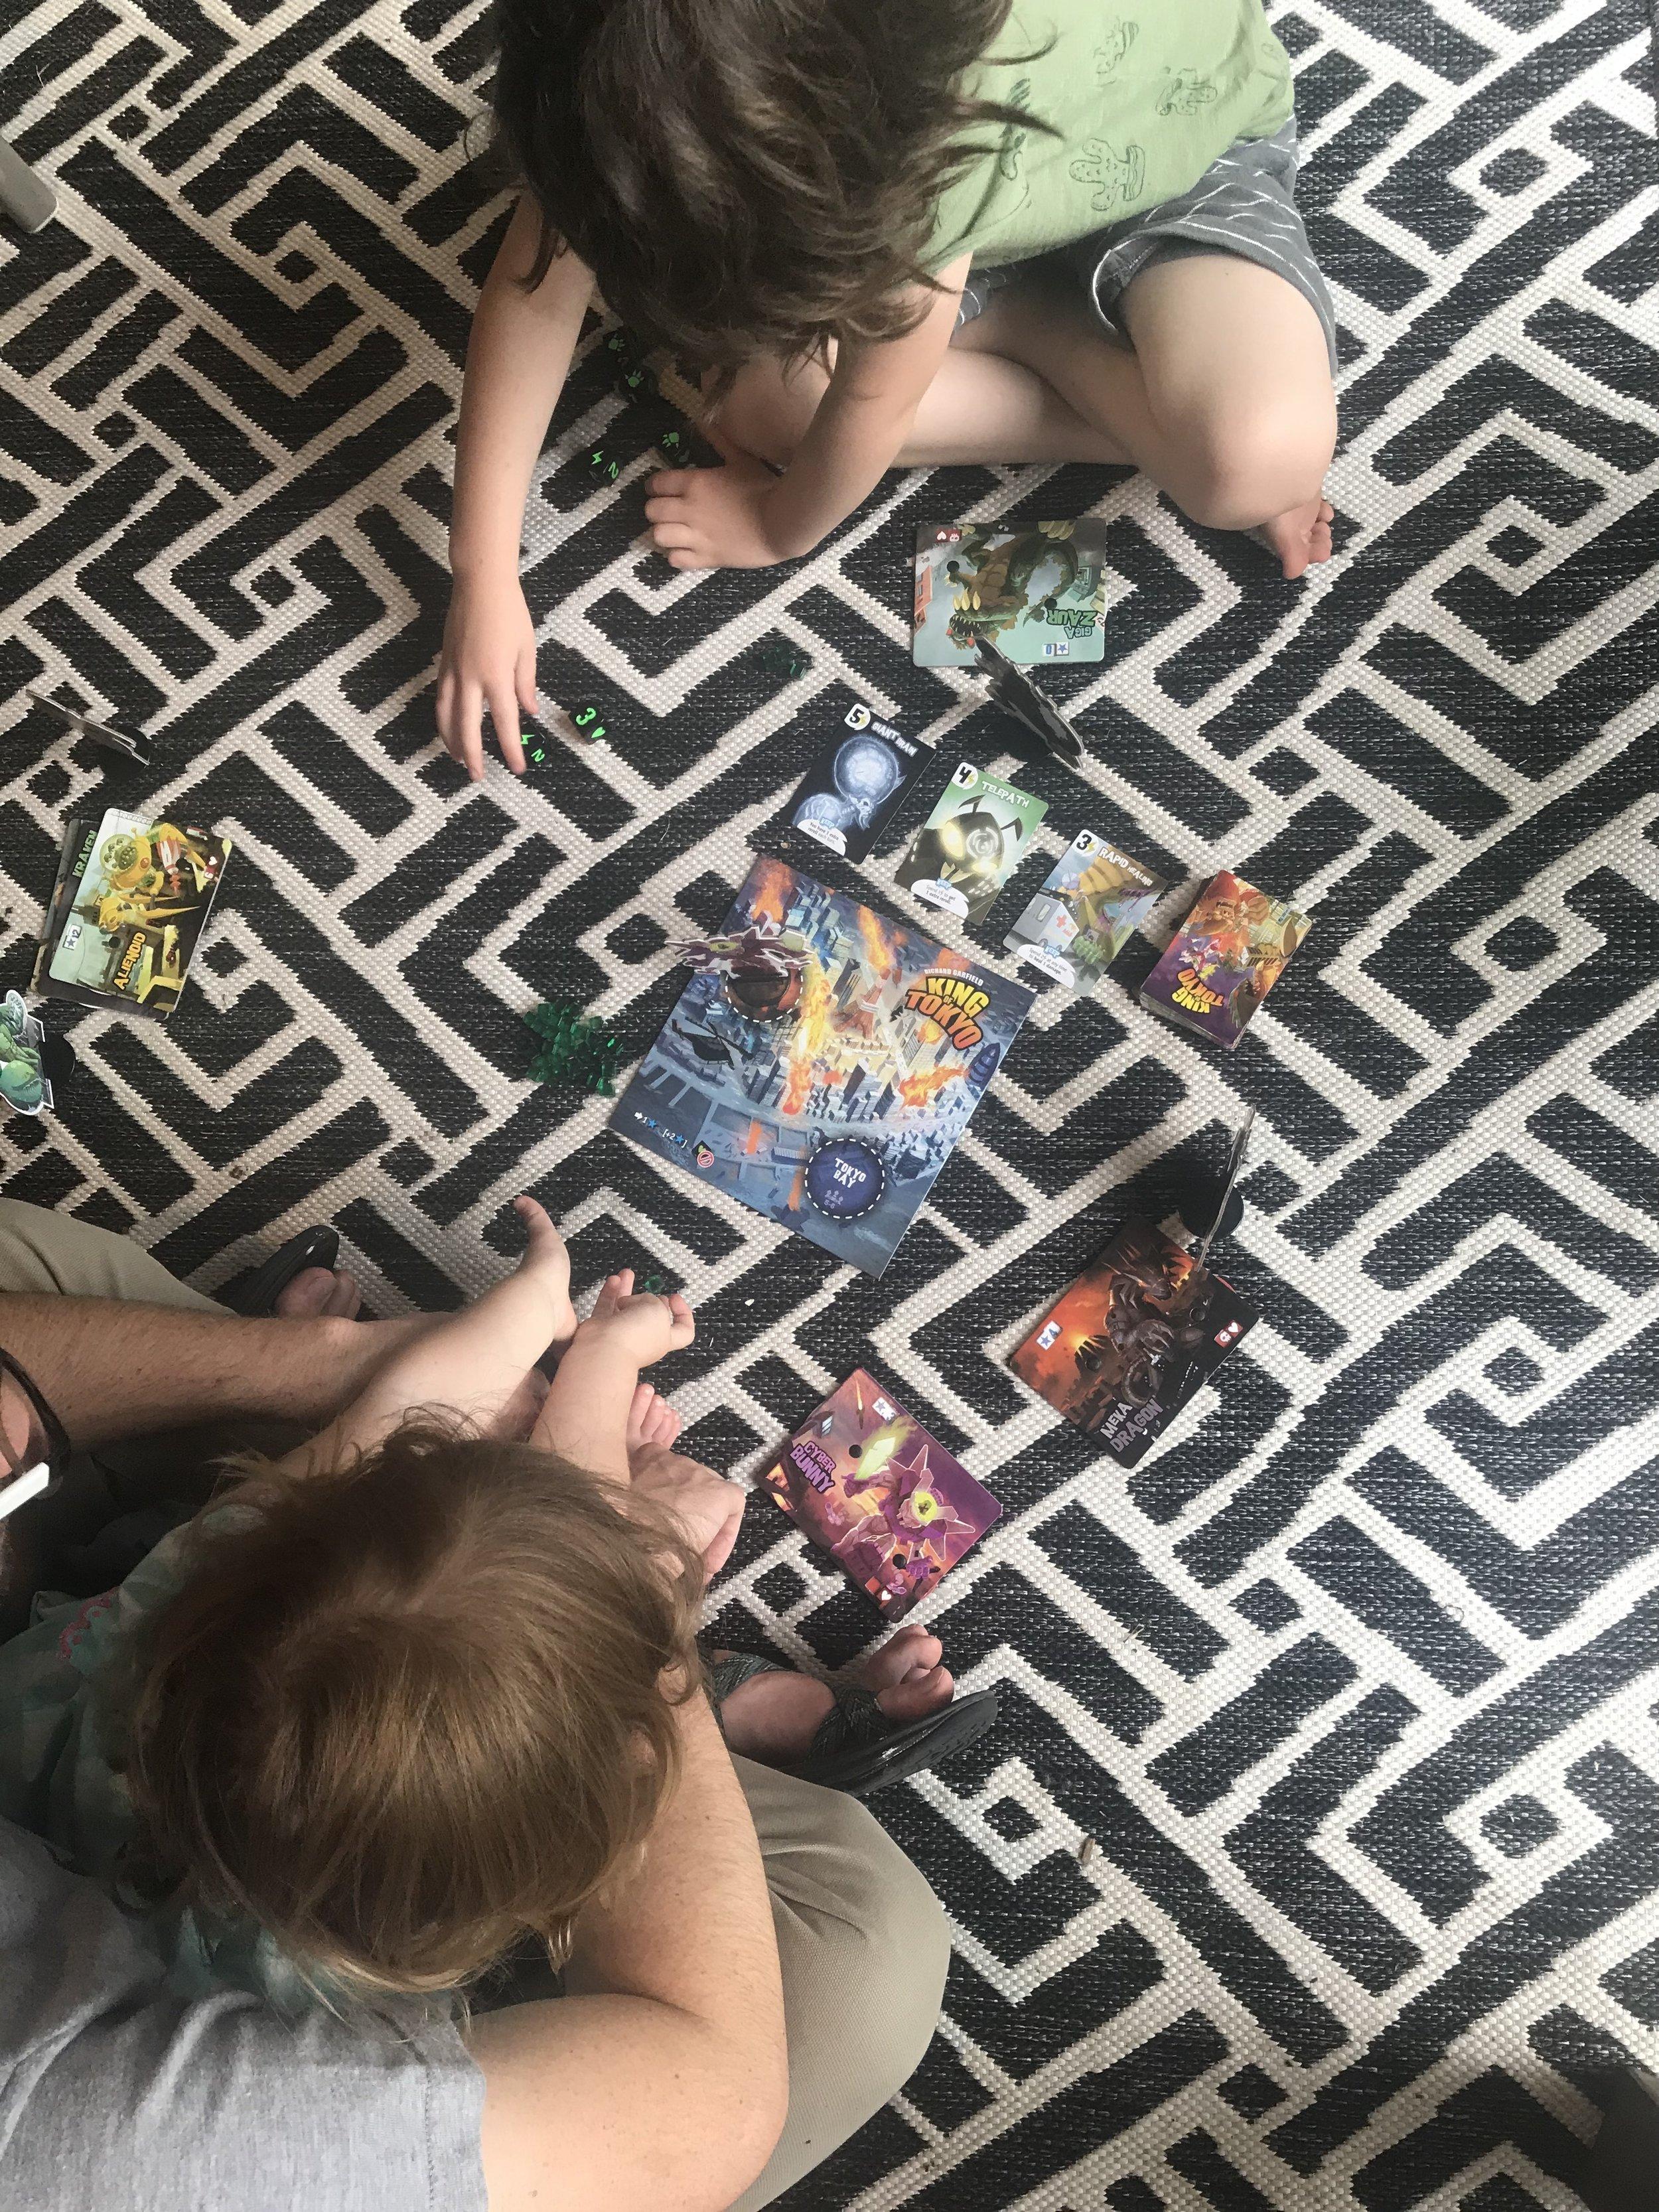 king of tokyo family board game 4.jpg